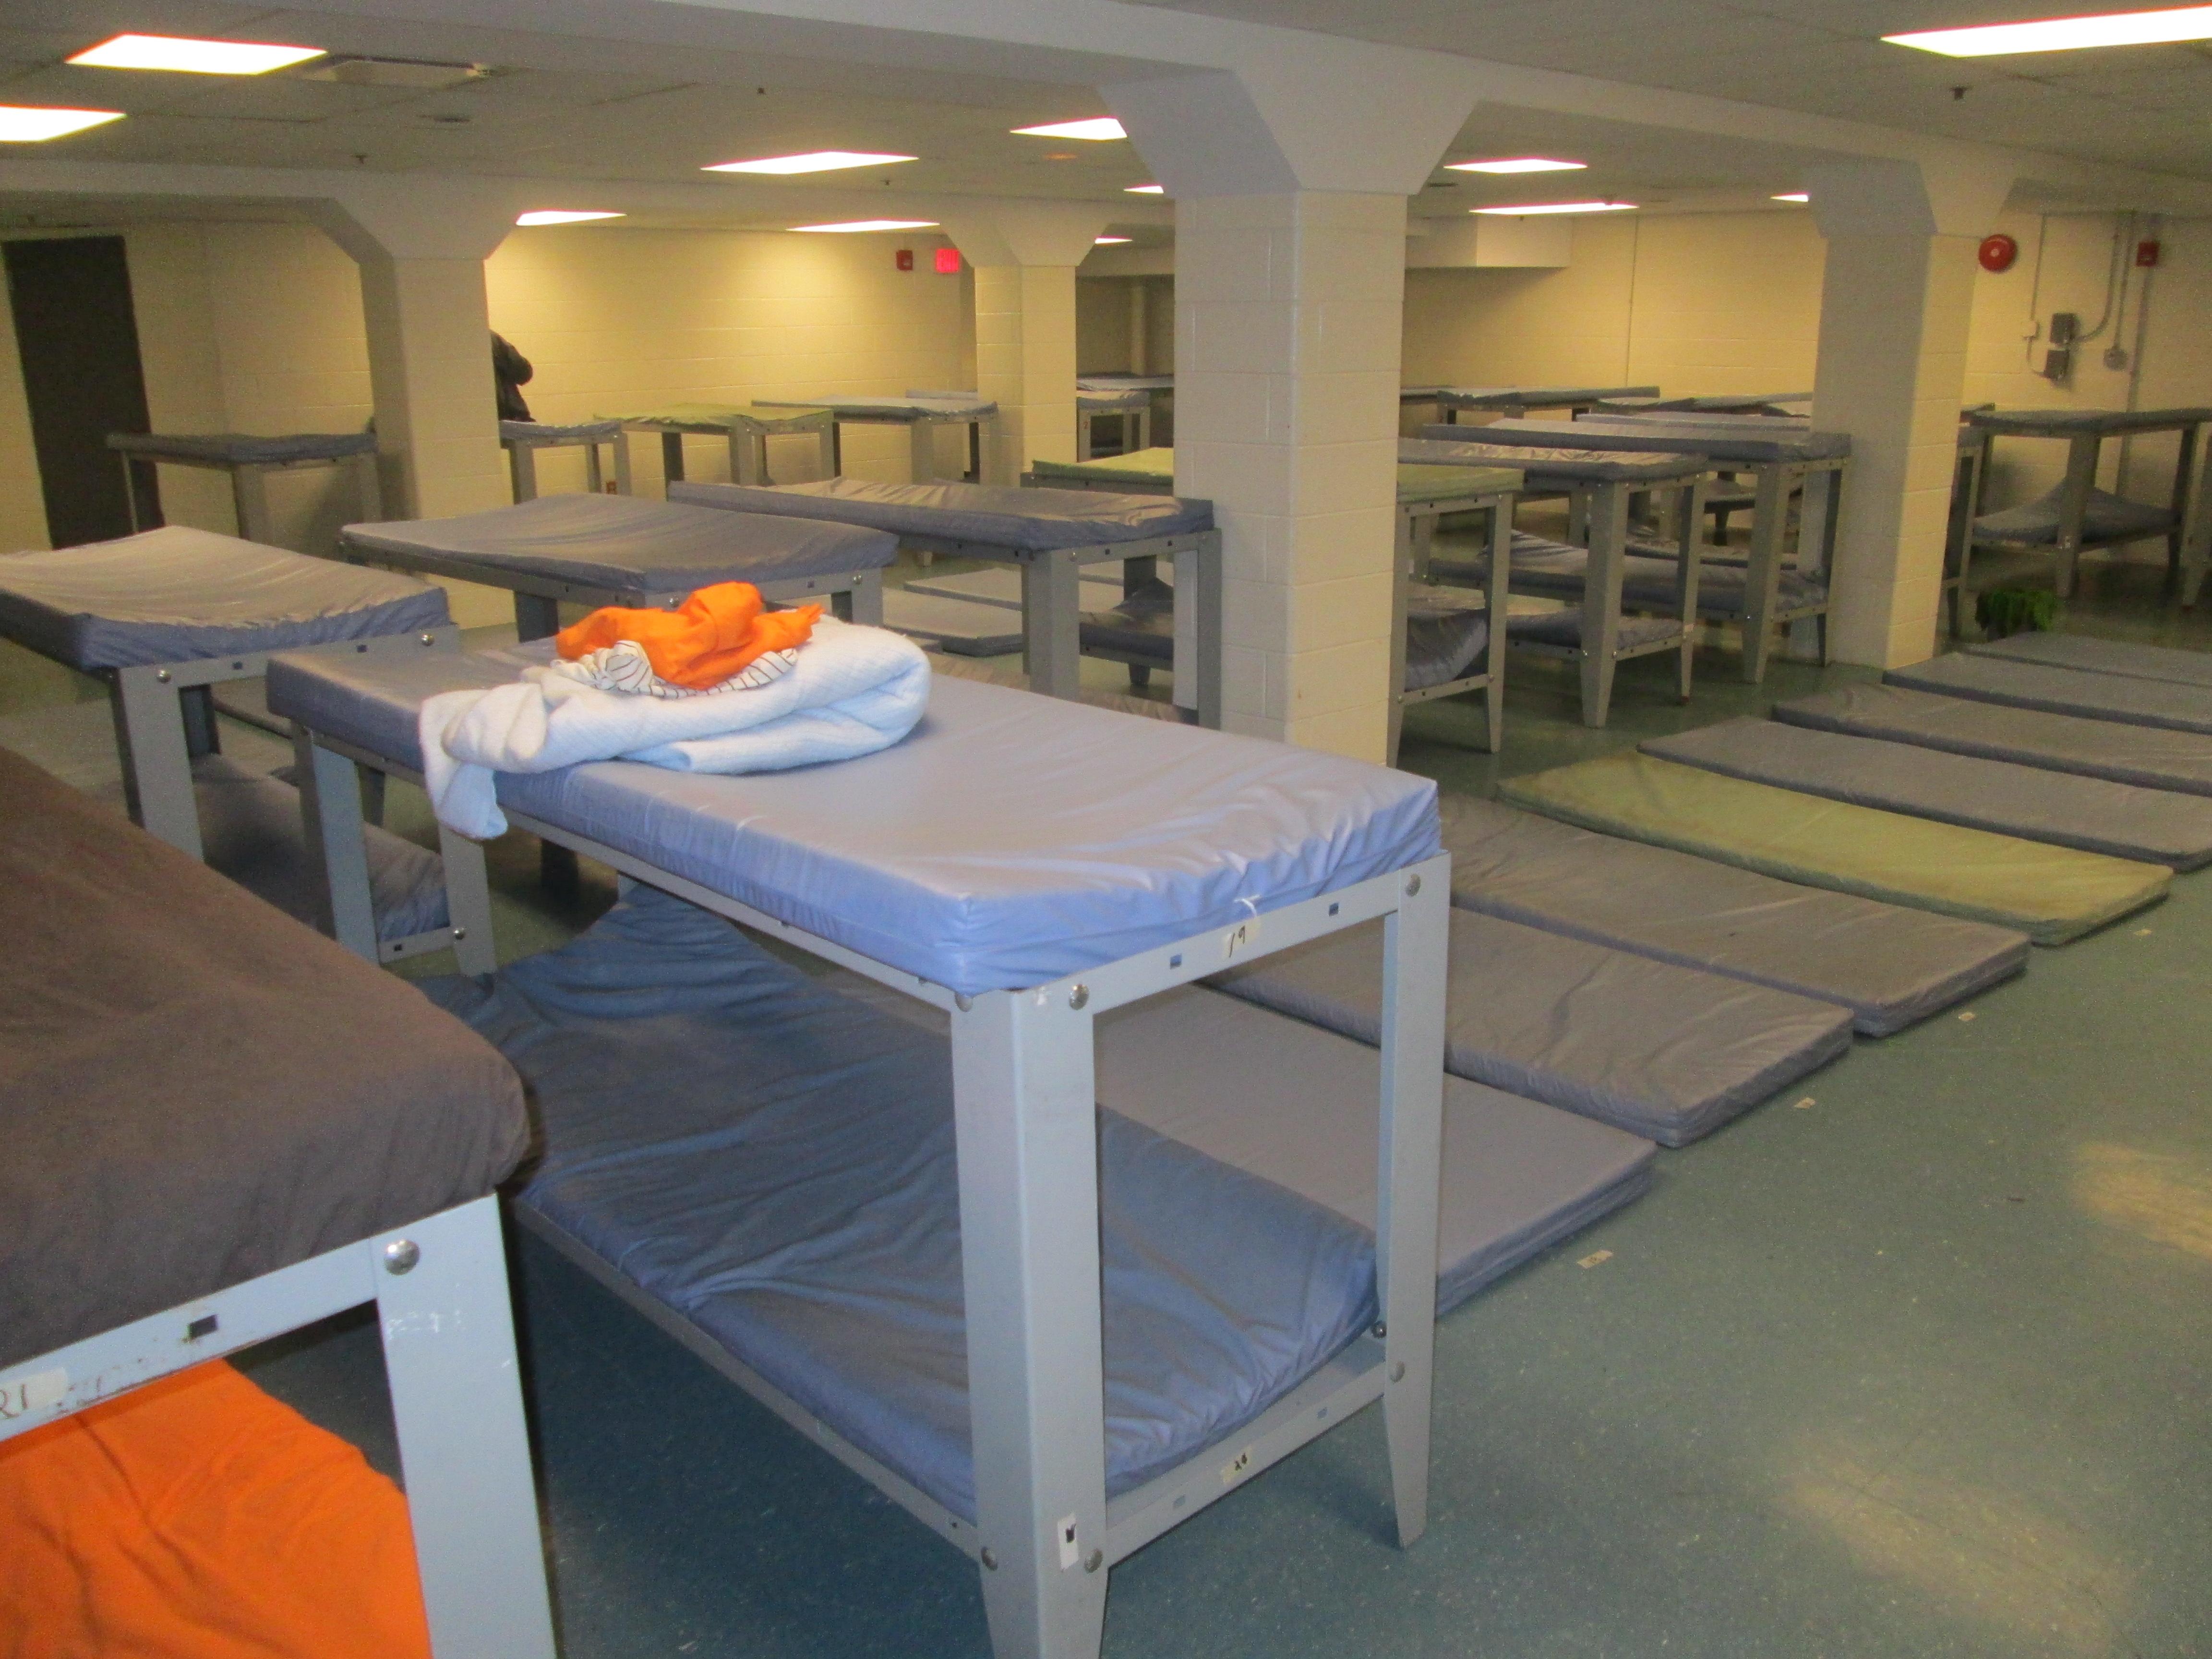 7 p.m.: Men's Sleeping Area (Overnight Emergency Shelter)